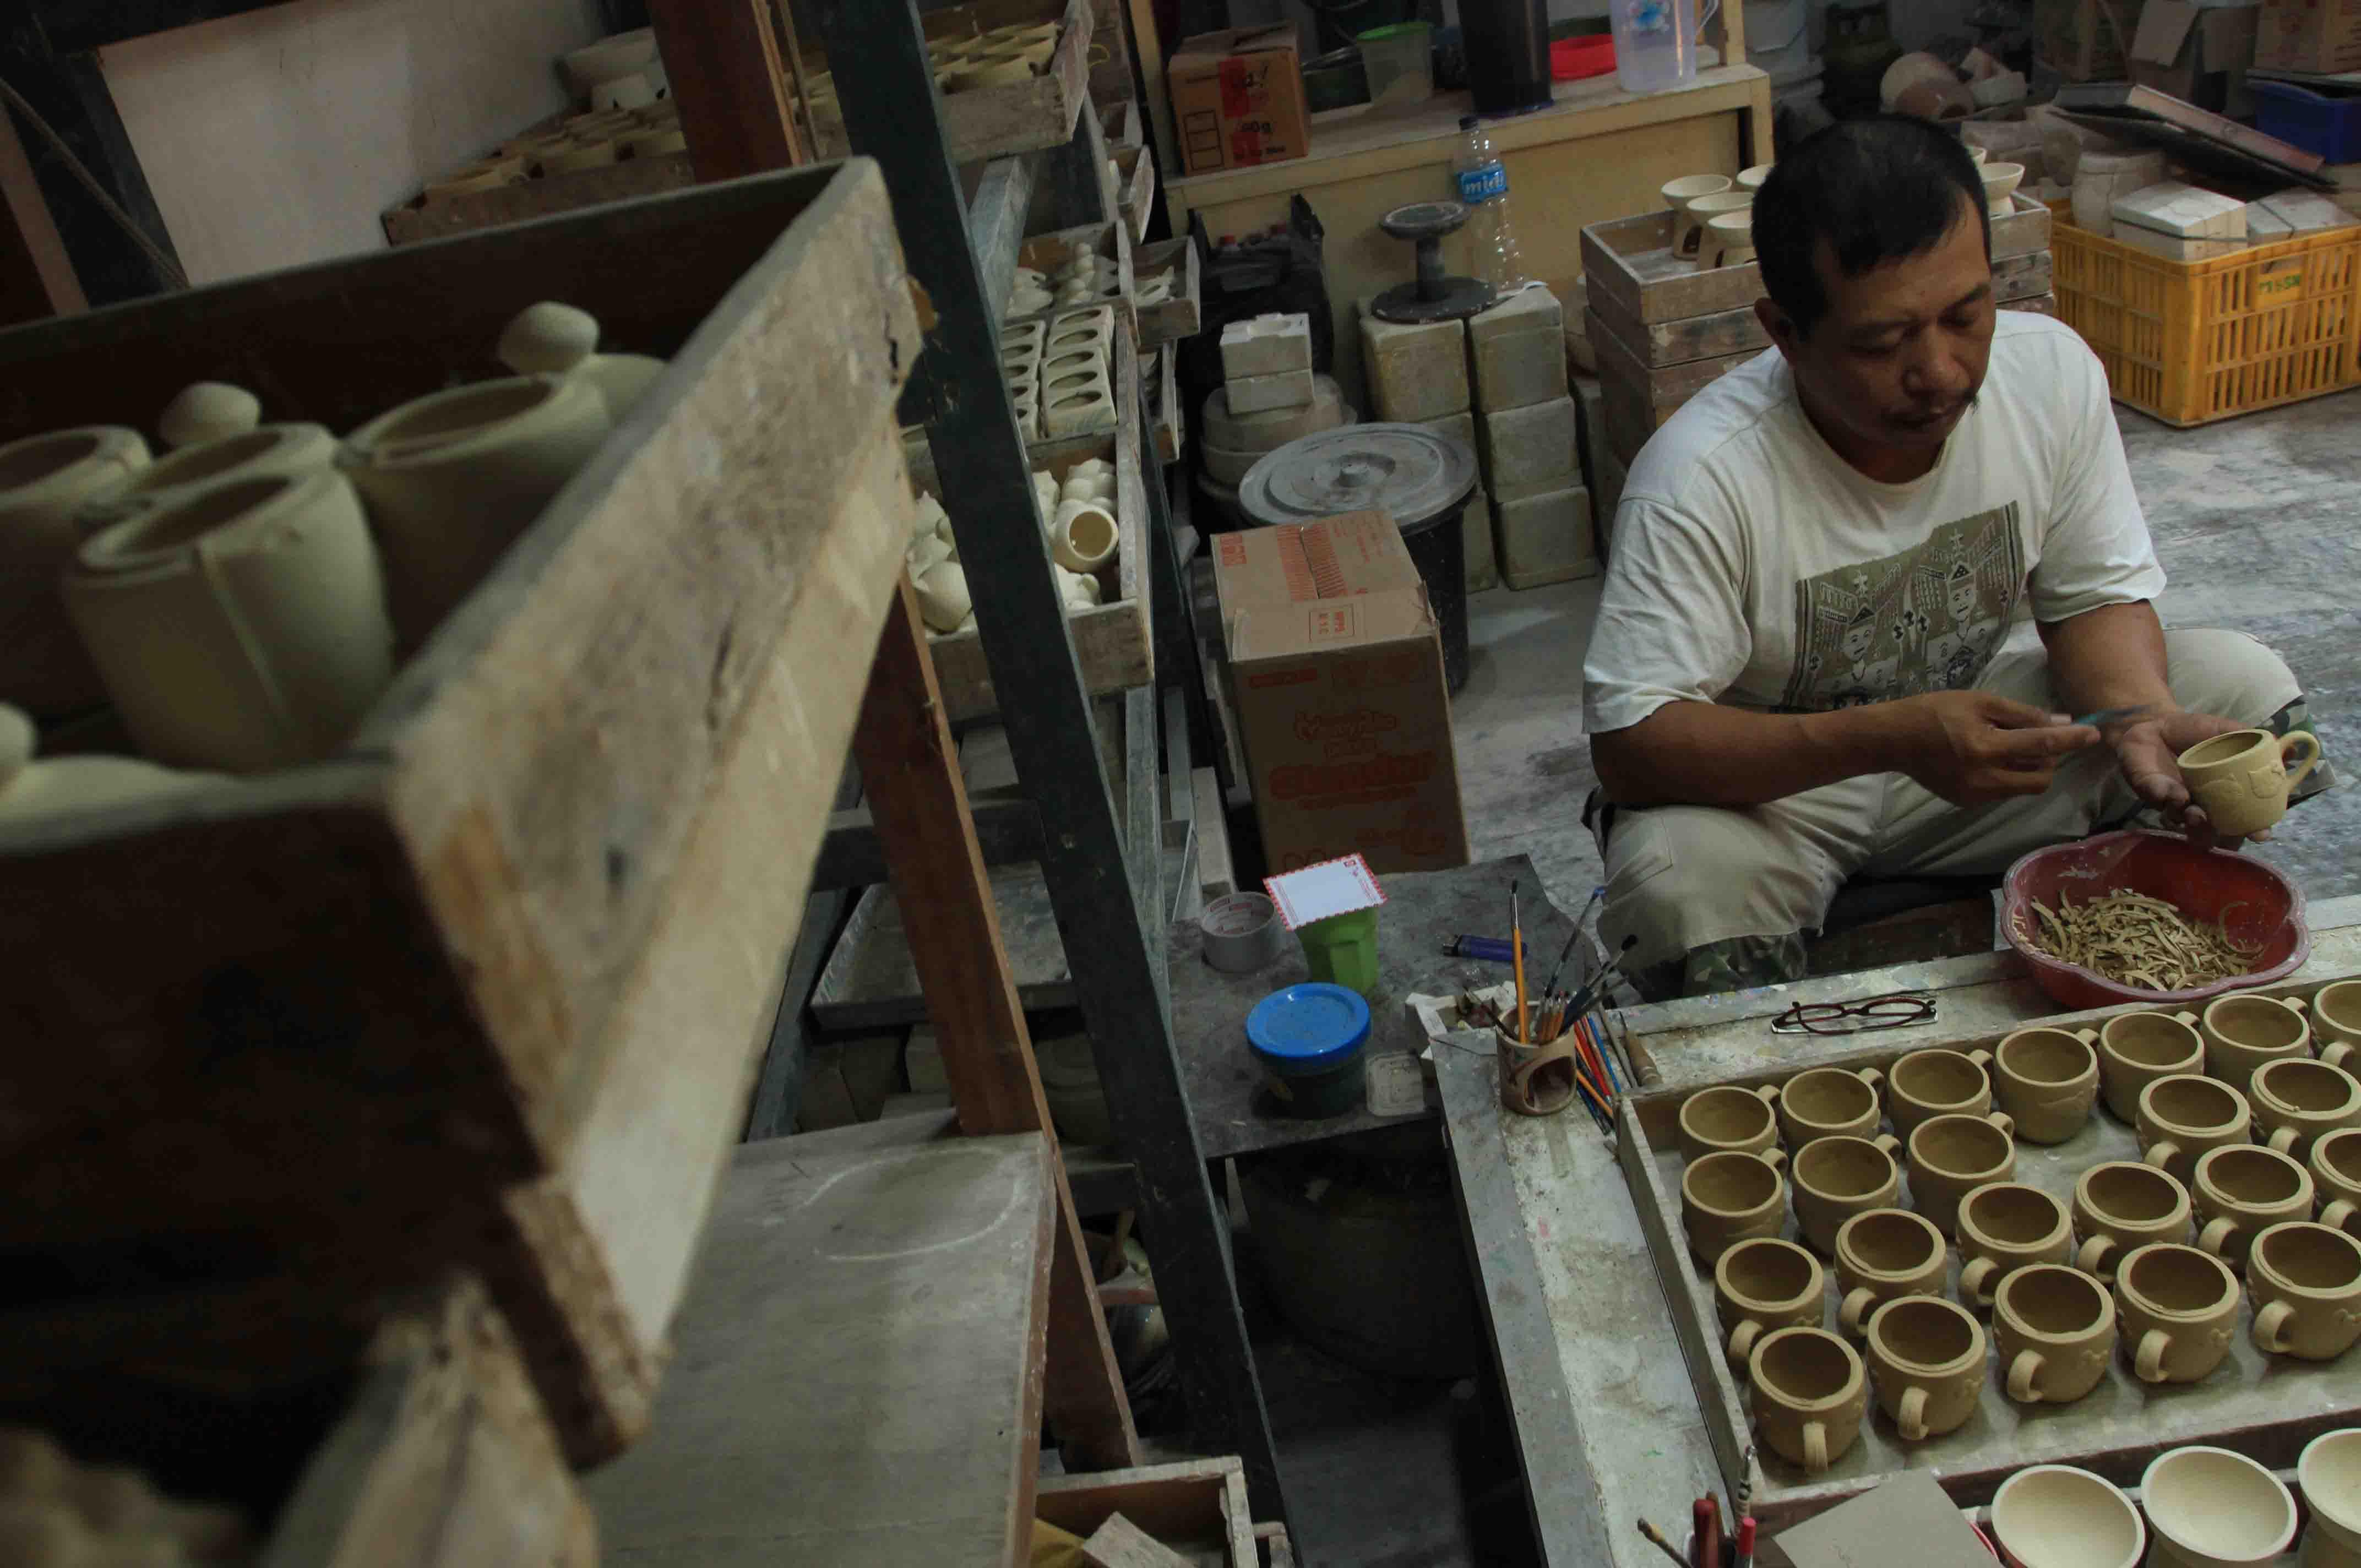 Menyusuri Kampung Keramik Dinoyo 1 Terakota Perajin Membuat Sentra Kota